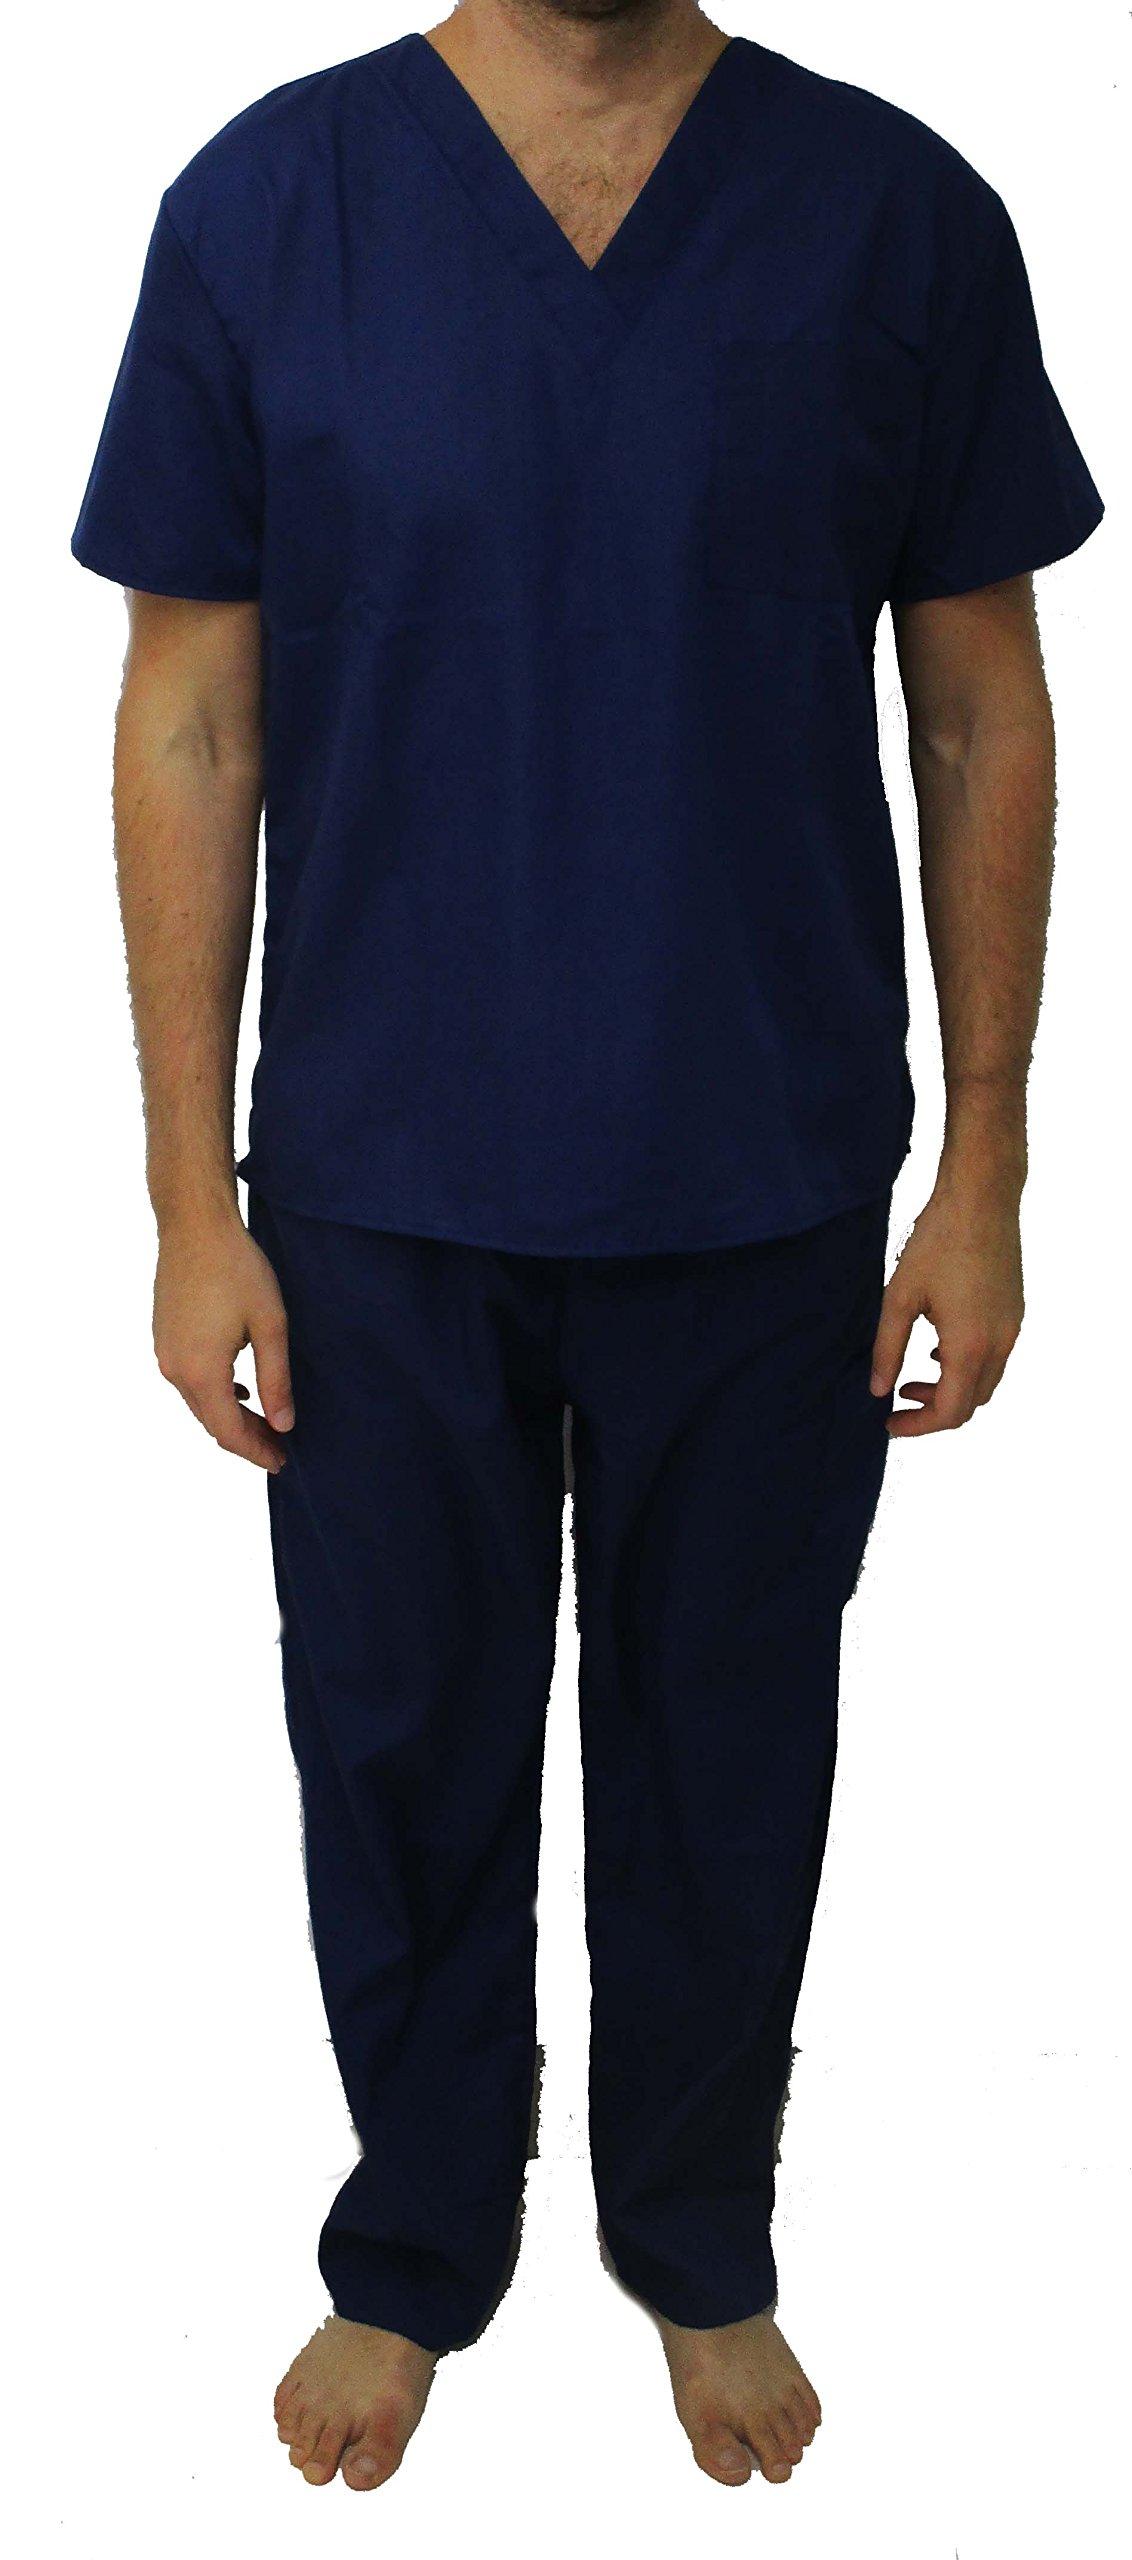 33300M-Navy-L Tropi Unisex Scrub Sets / Medical Scrubs / Nursing Scrubs by Tropi (Image #1)